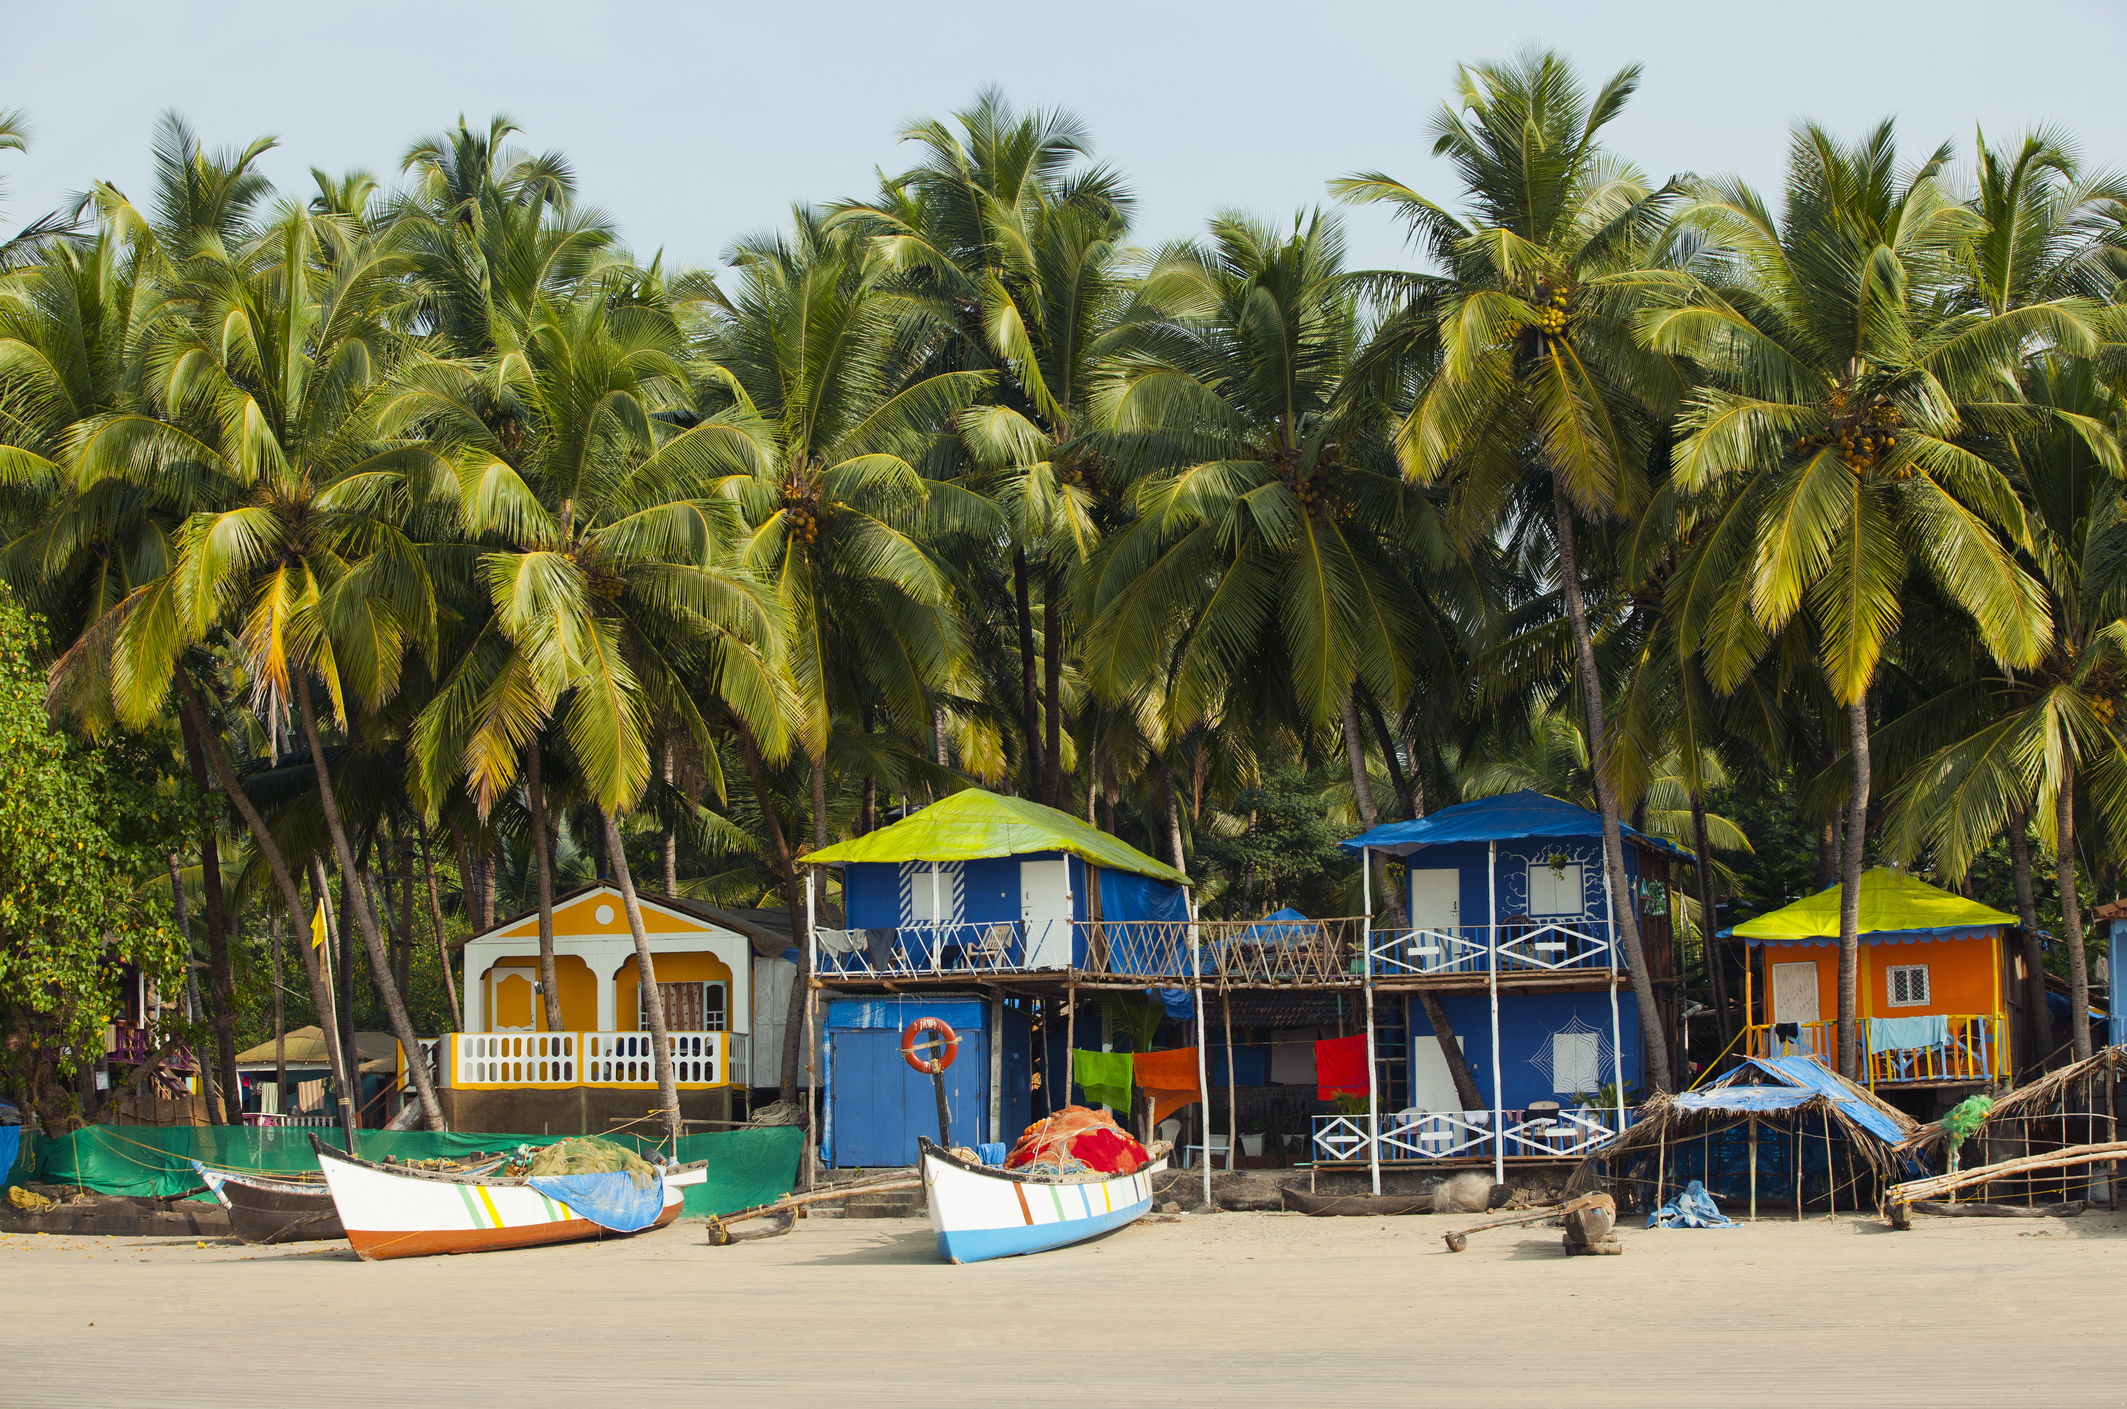 Colorful bungalows on Palolem Beach, Goa